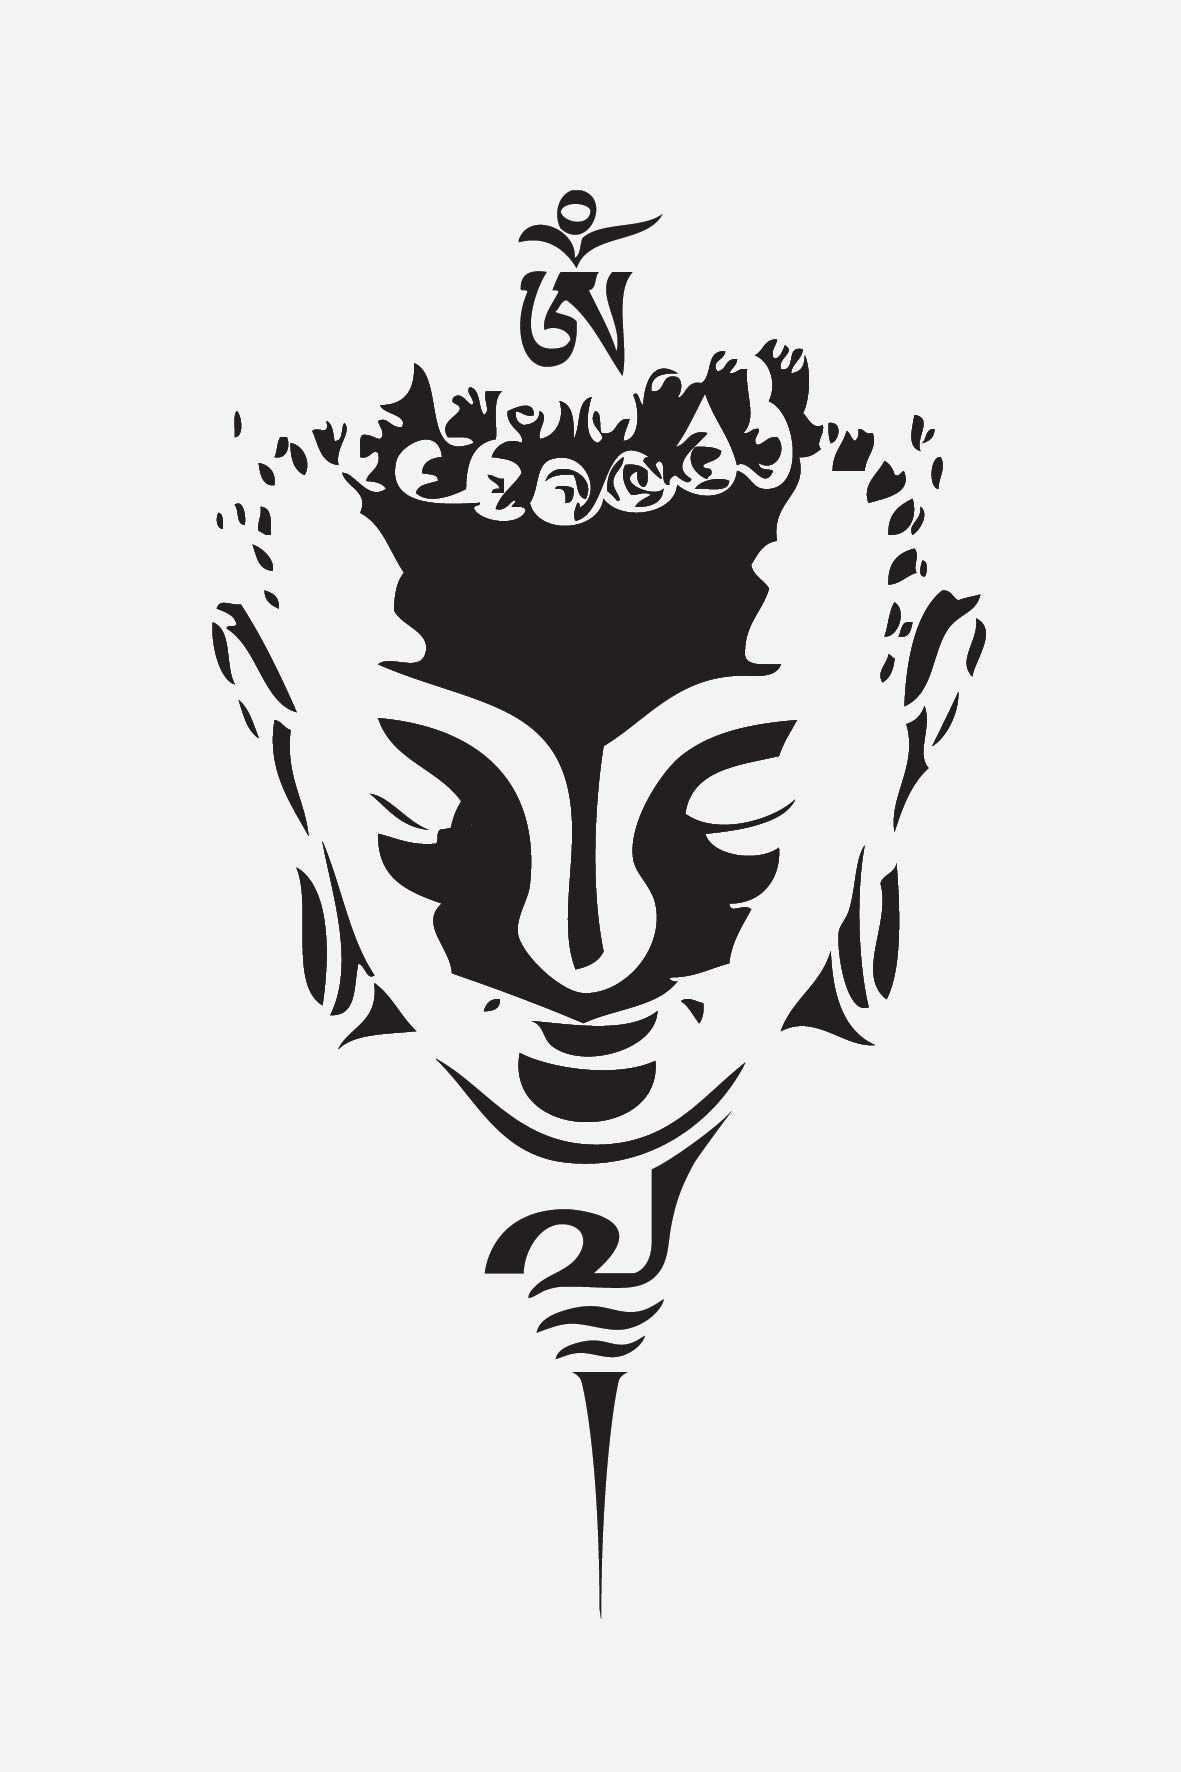 Buddah Face Essential T Shirt By Dxd Dead By Design Buddha Tattoos Buddha Art Buddha Painting